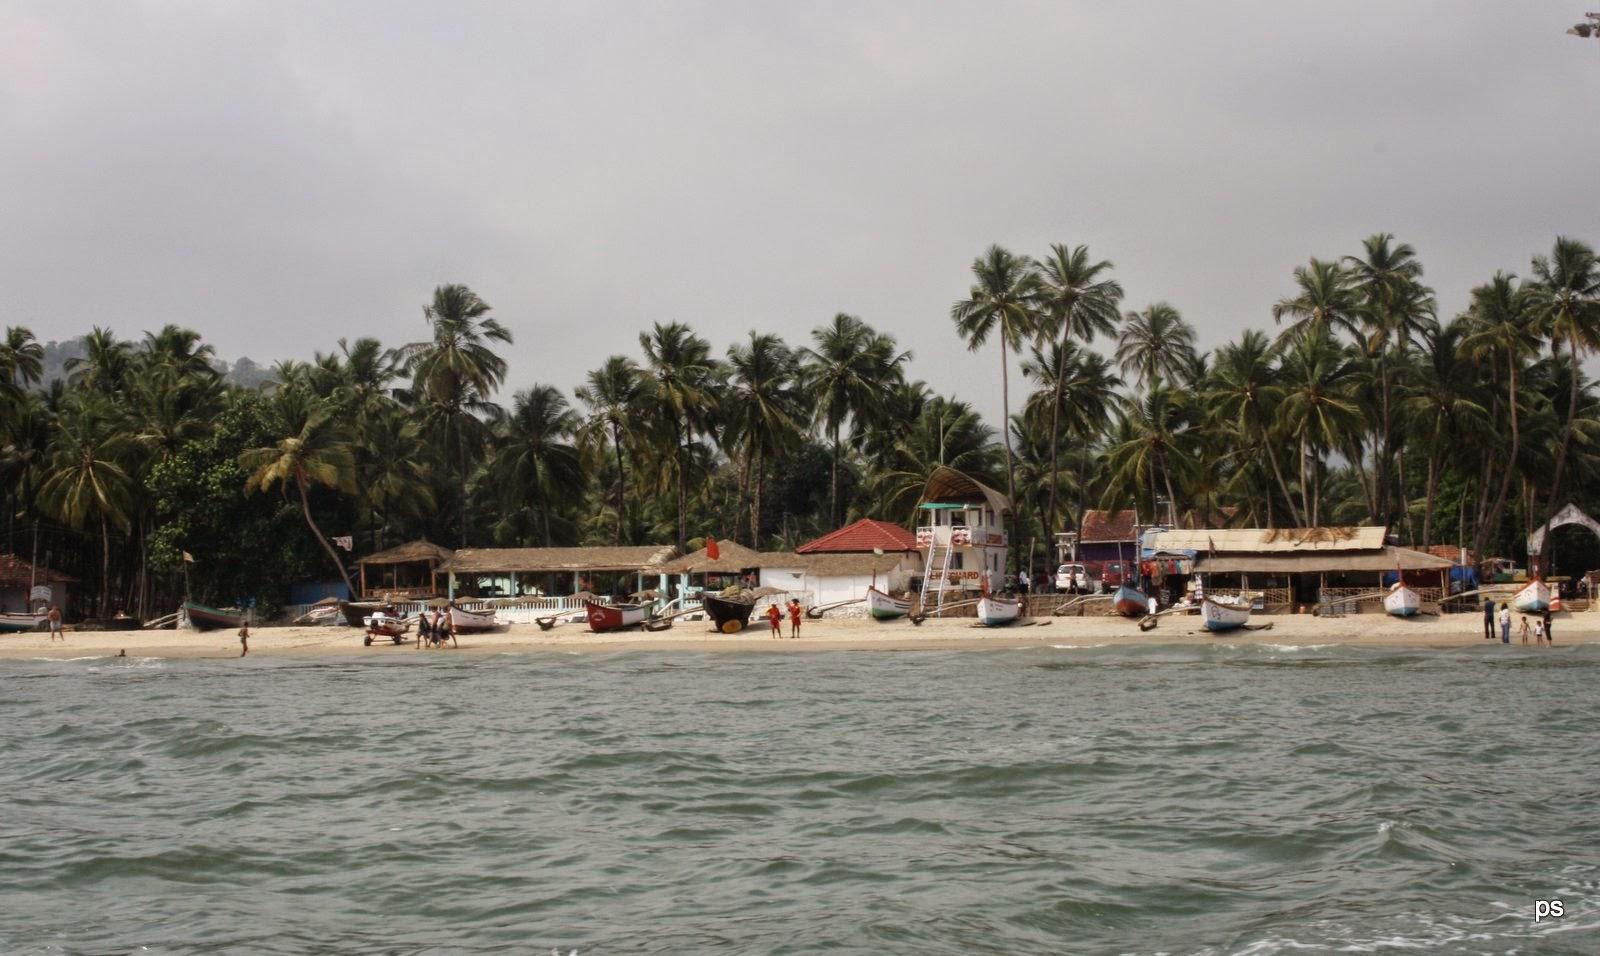 Cavelossium Beach